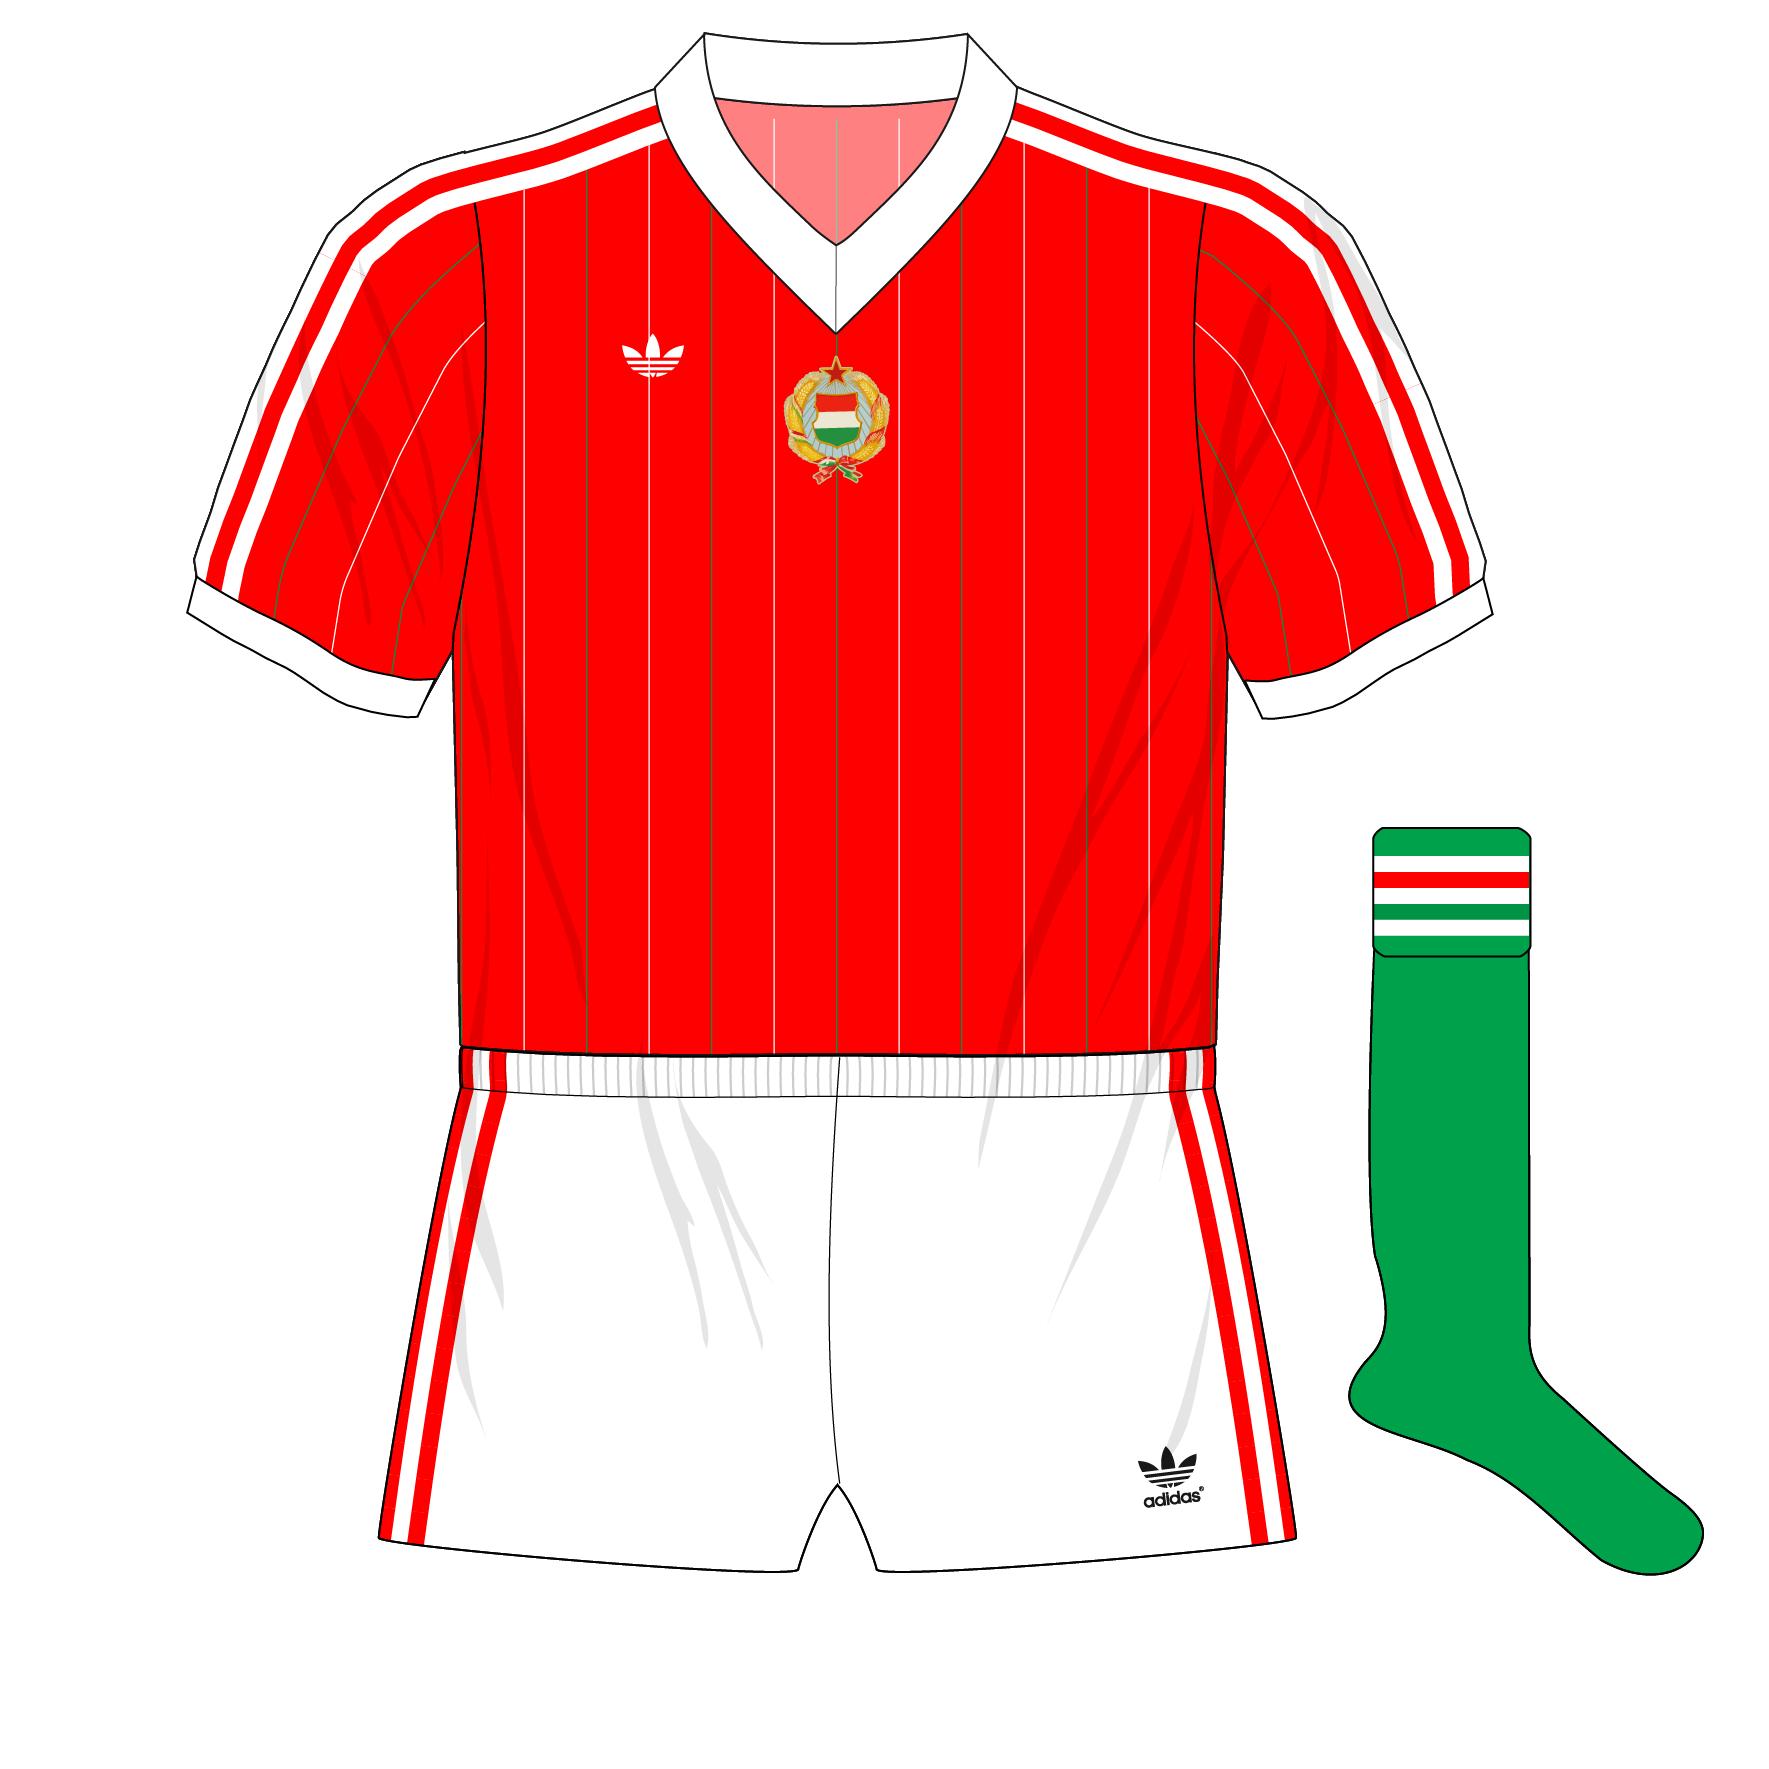 brand new 094e5 53c98 Hungary-adidas-1984-shirt-Netherlands-clash-01-01 – Museum ...